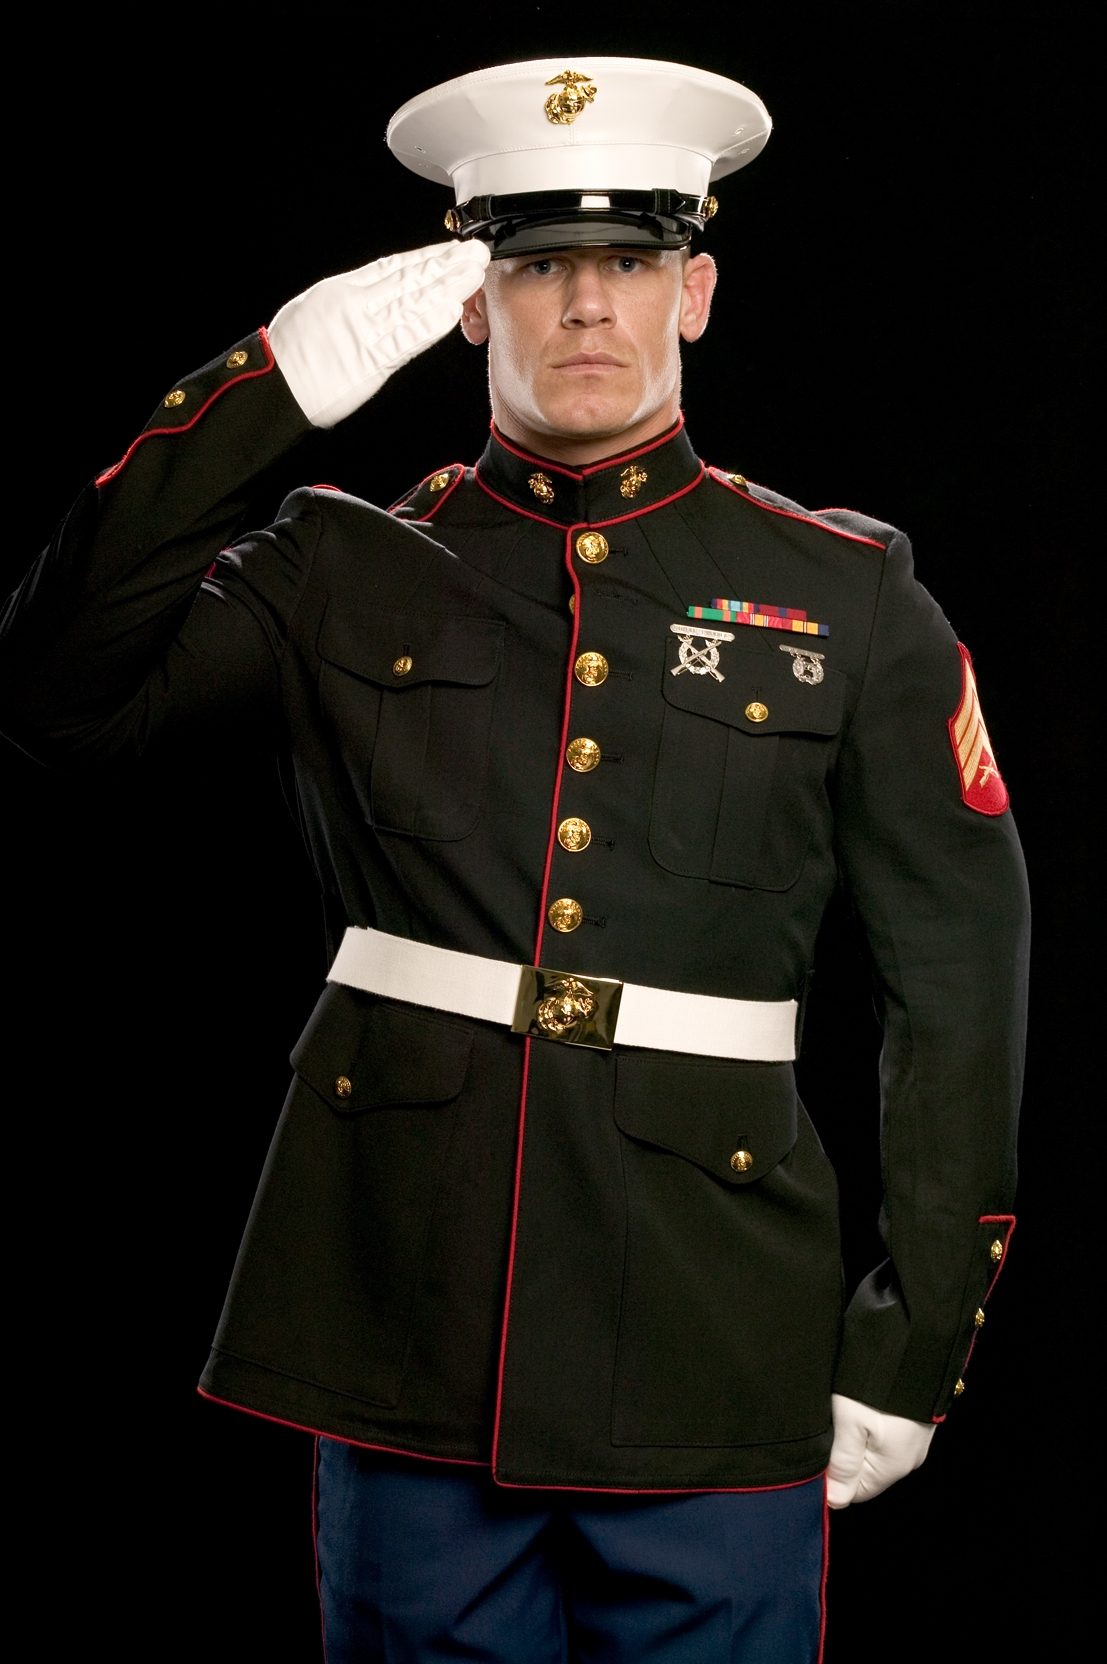 John Cena In The Marine Corps | www.pixshark.com - Images ...